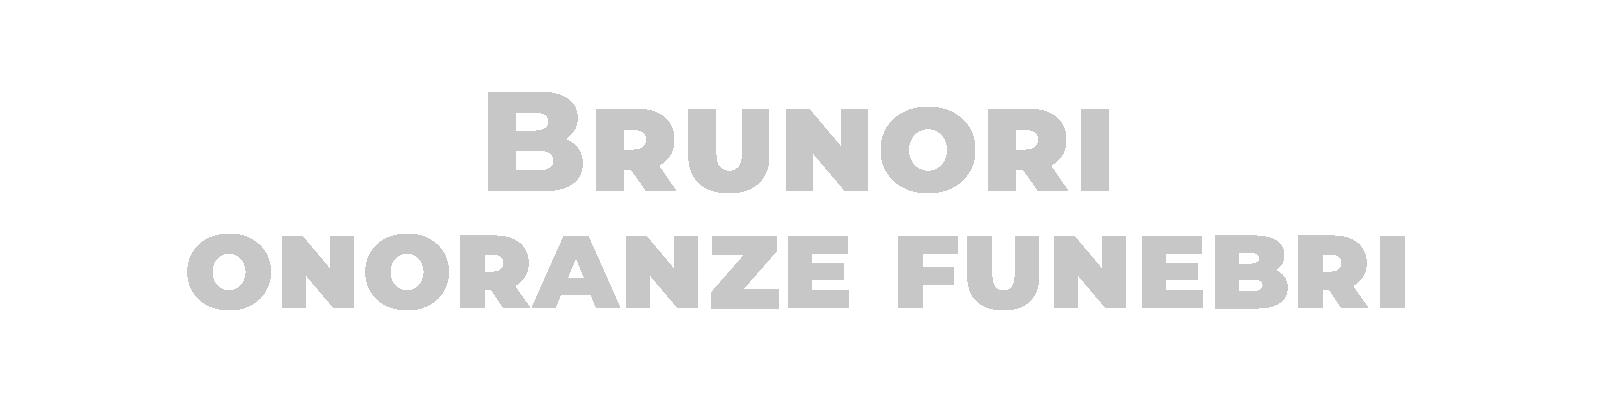 logo brunori